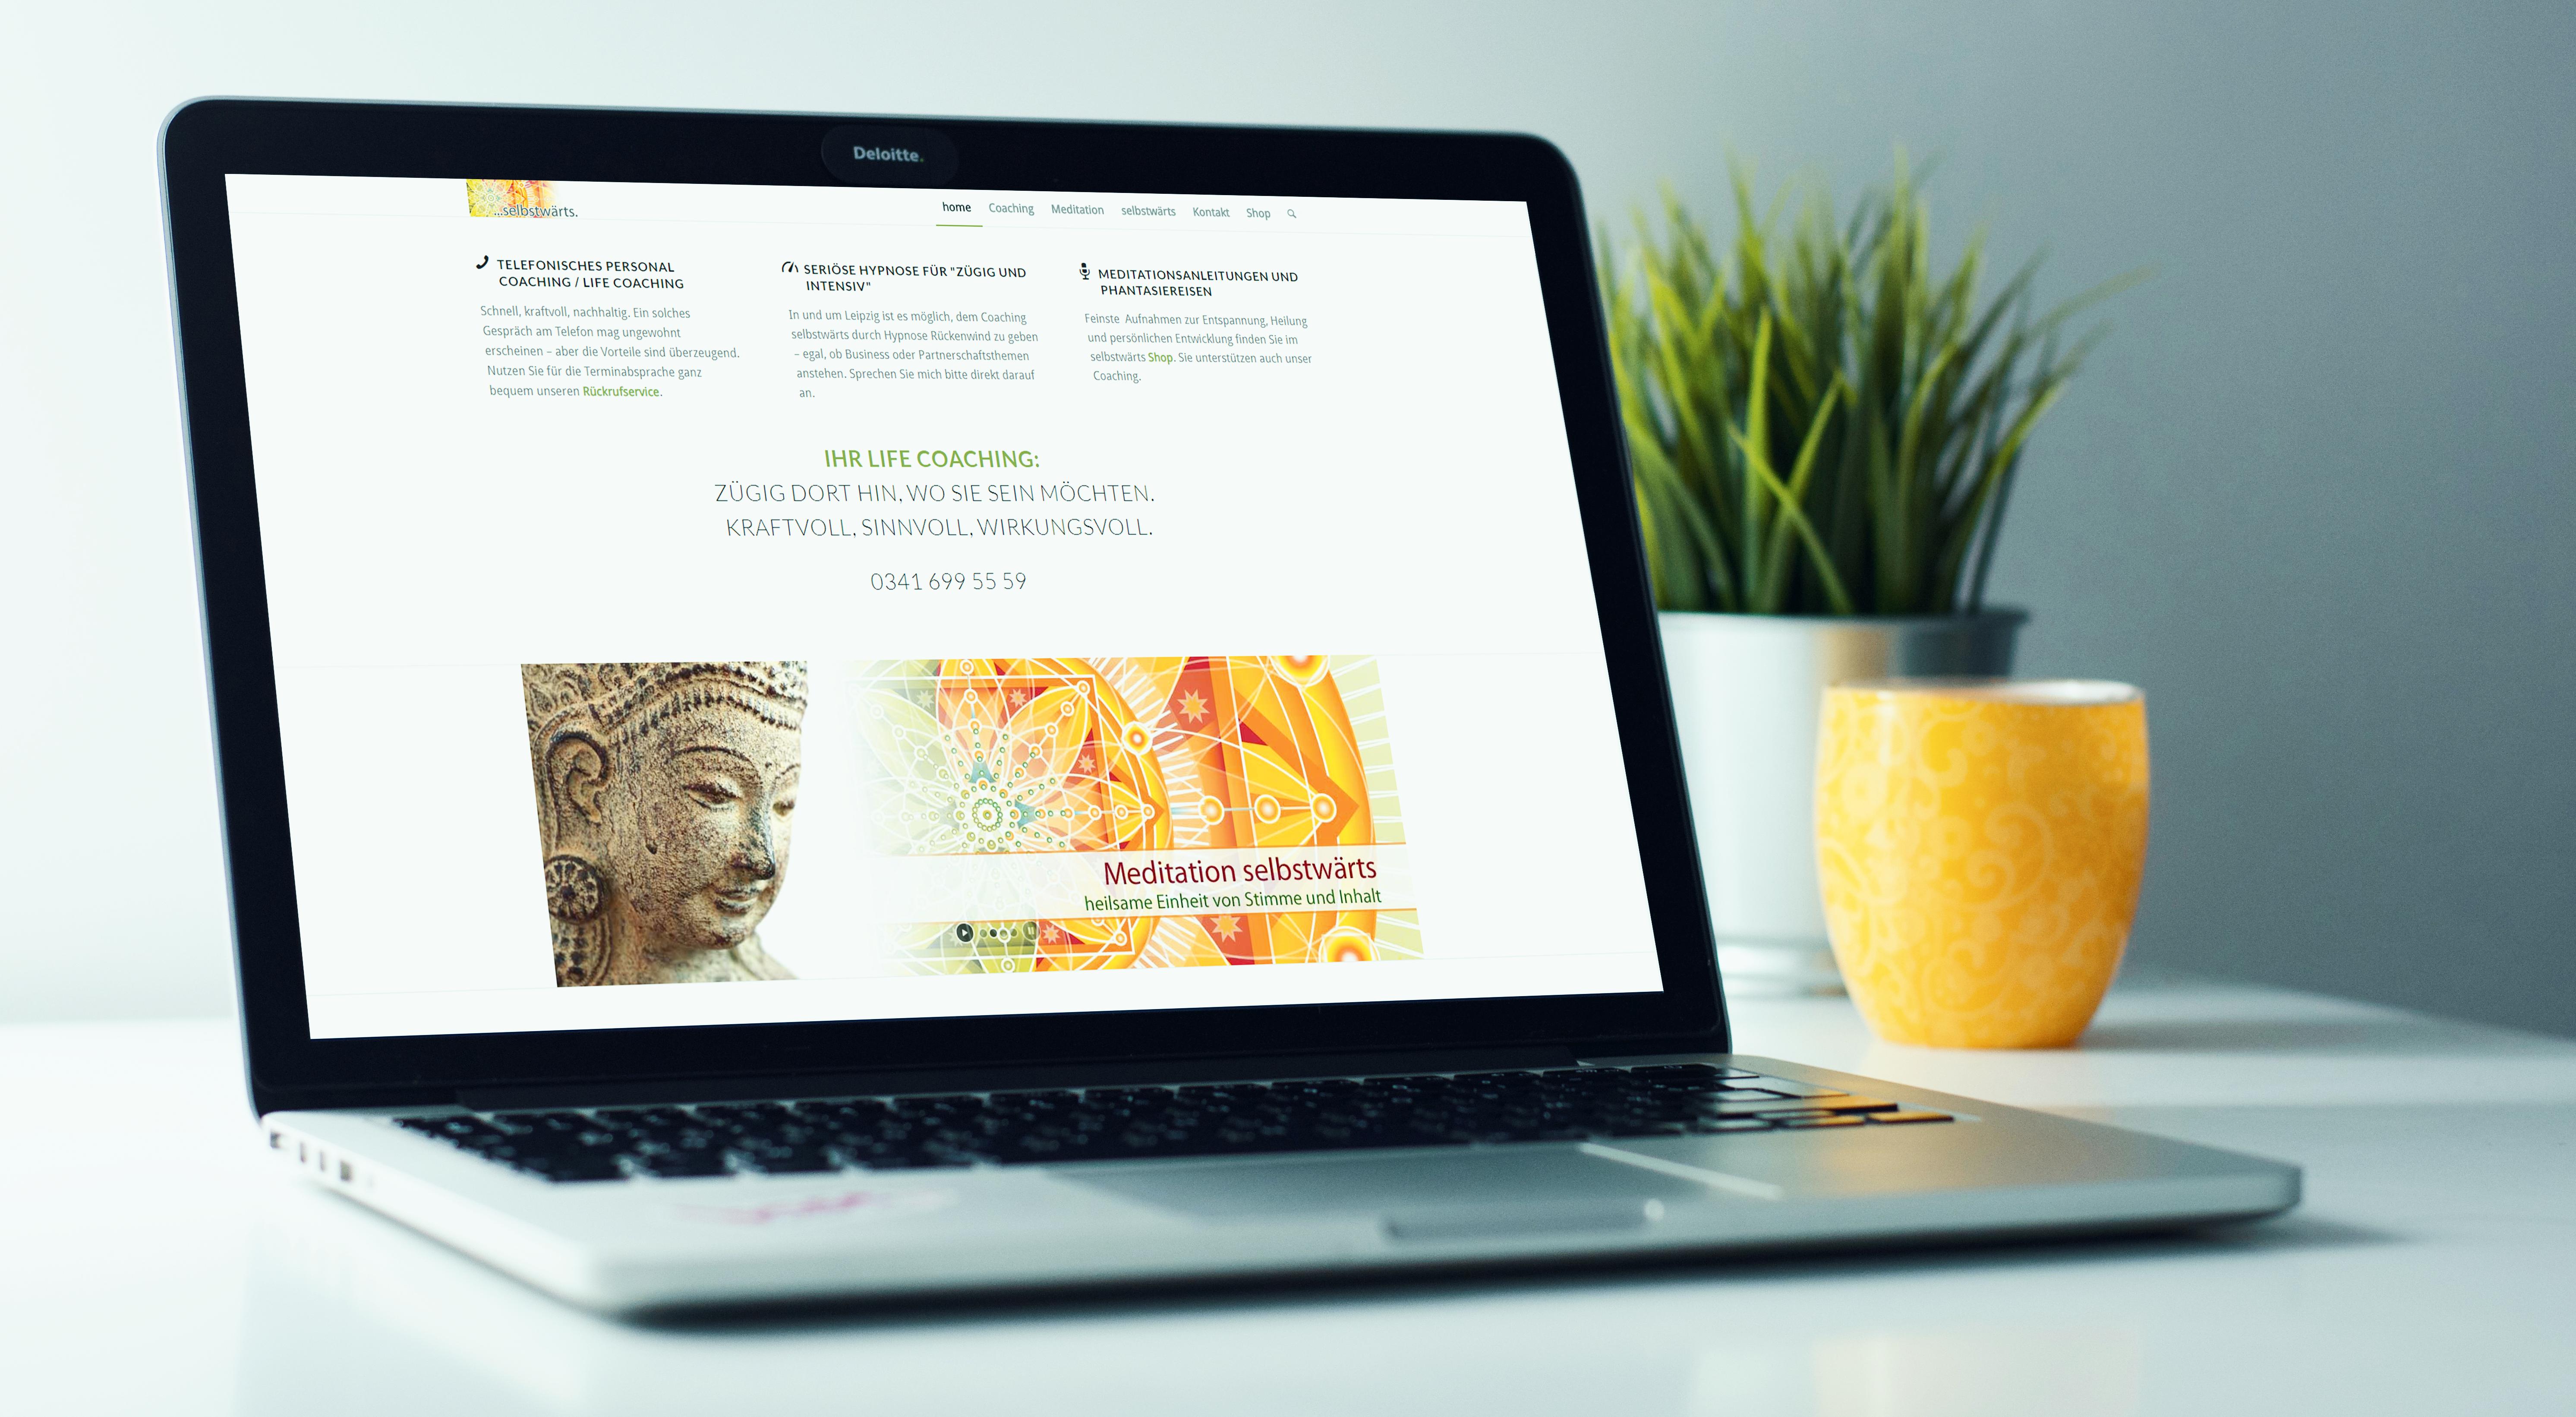 Laptop mit Website - Meditation selbstwärts